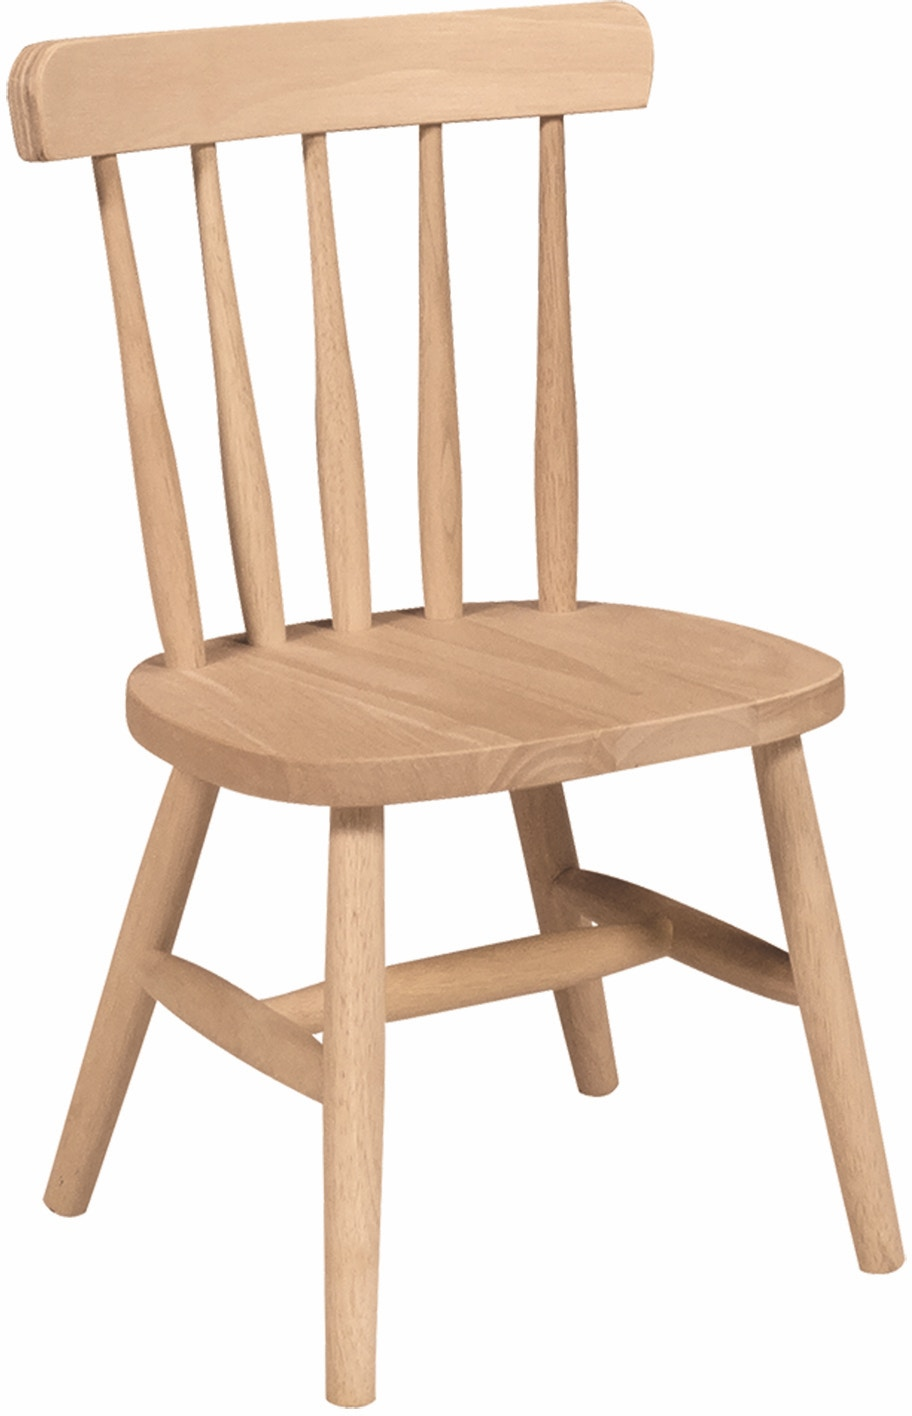 John Thomas Bar And Game Room Tot S Chair 1124 Klingman S